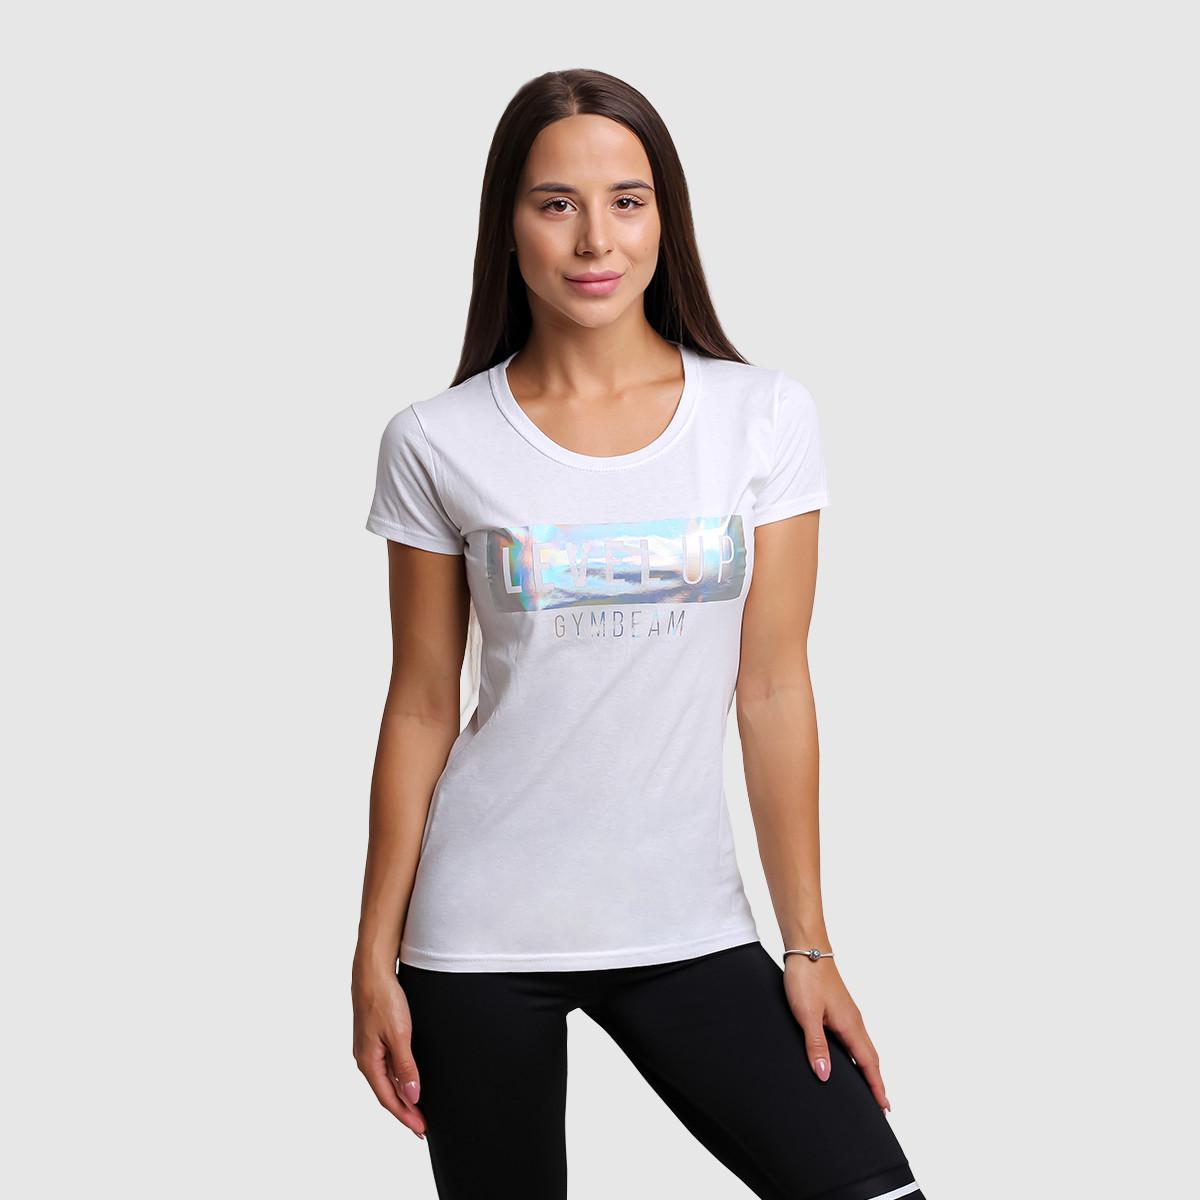 Dámské tričko Level Up White - GymBeam